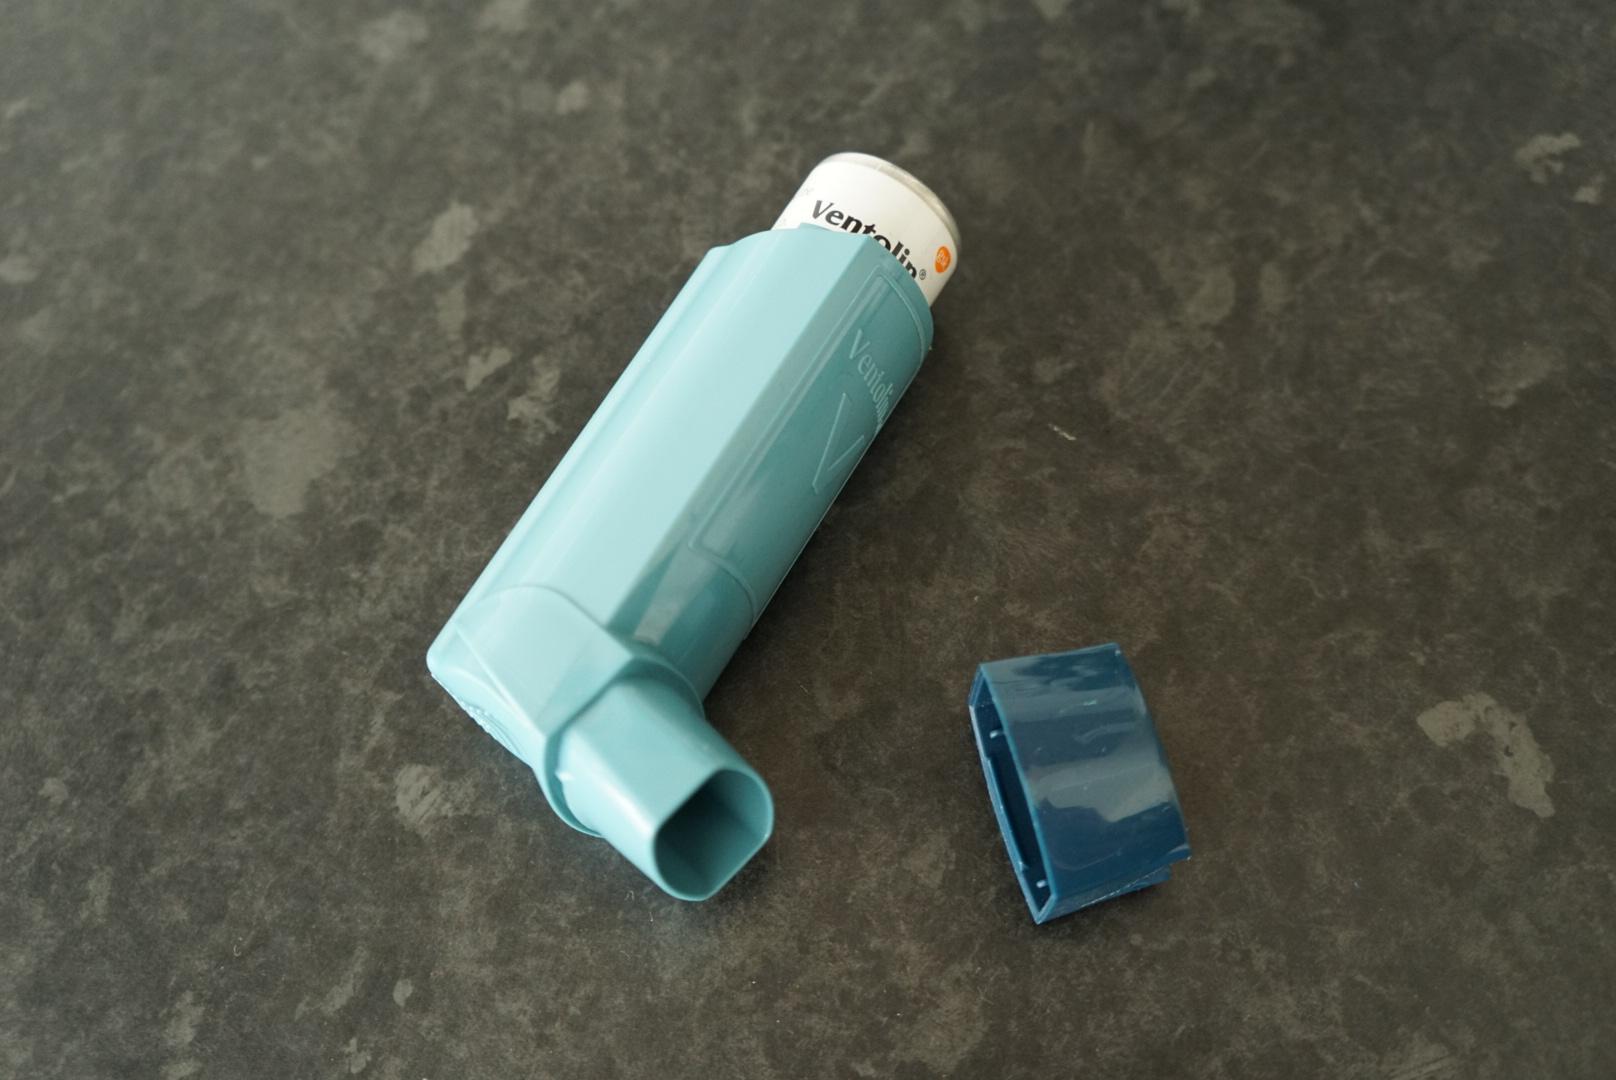 asthma pump APL.jpeg